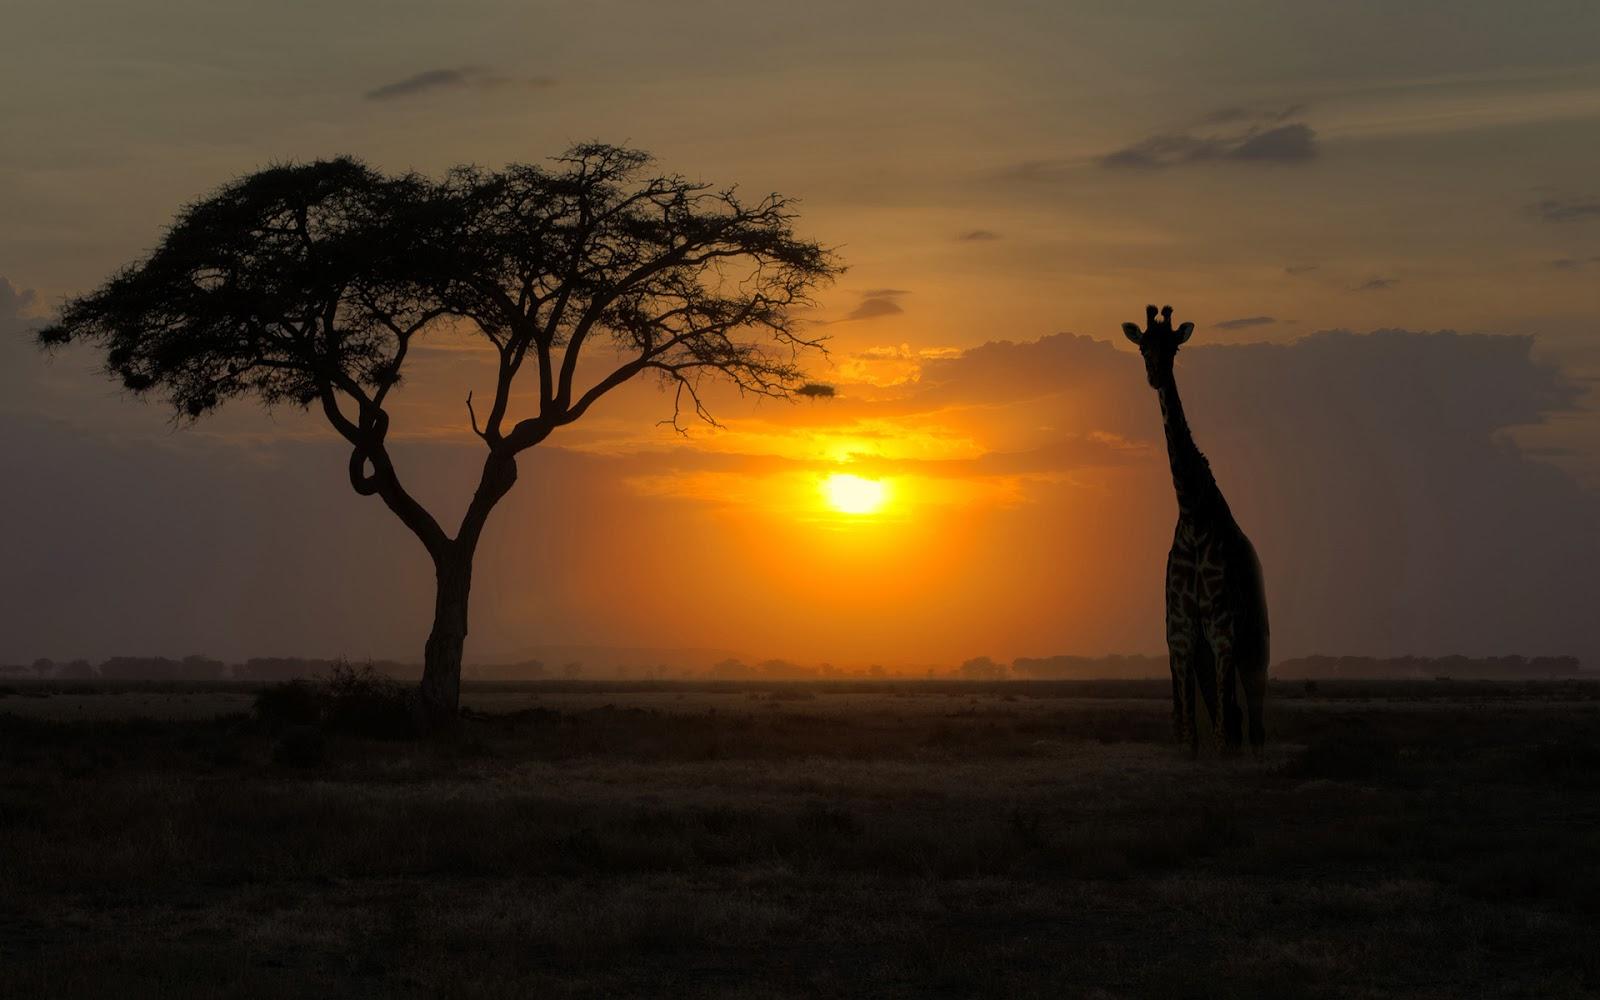 30 Stunning Full HD Wallpapers of Giraffe | Hindi